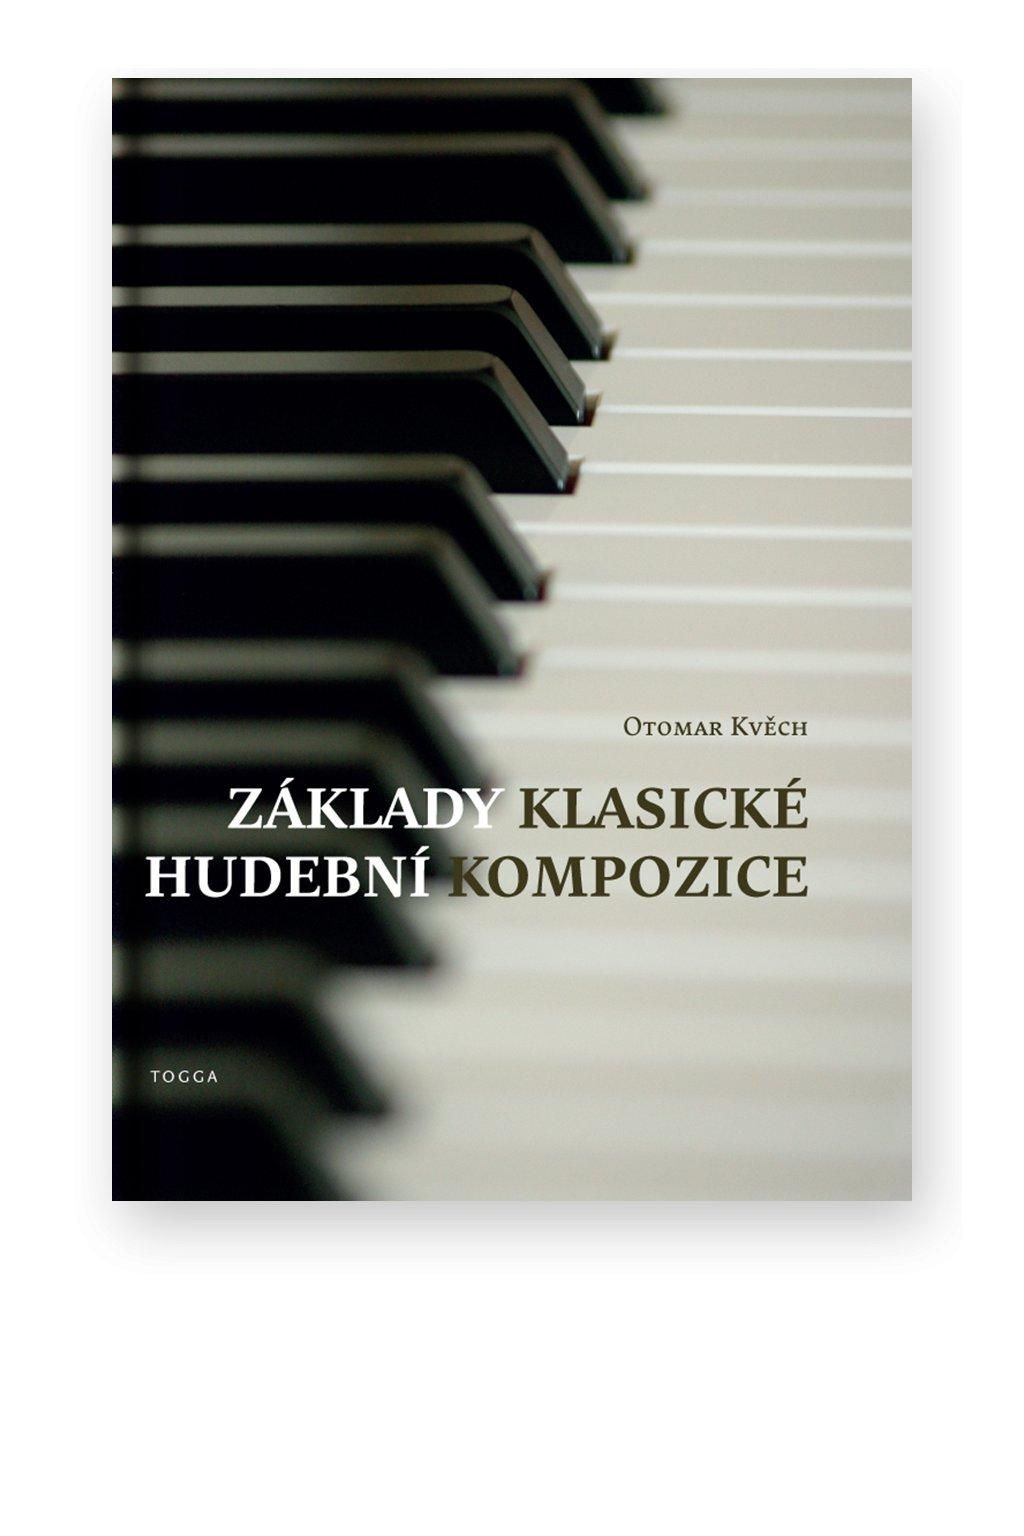 693 zaklady klasicke hudebni kompozice